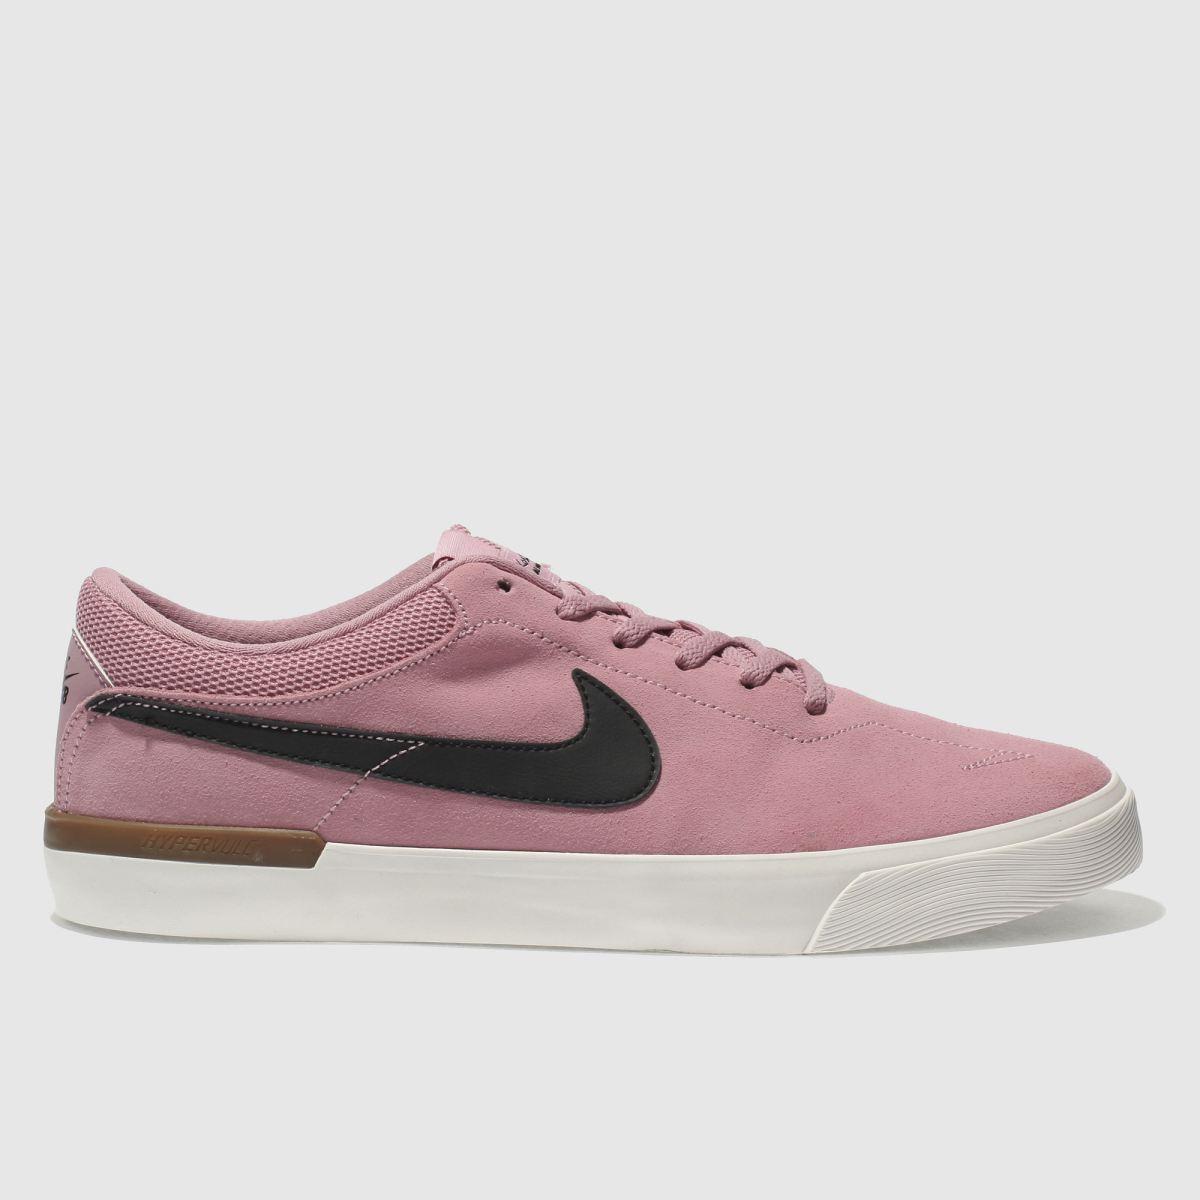 Nike SB Nike Sb Pink Koston Hypervulc Trainers